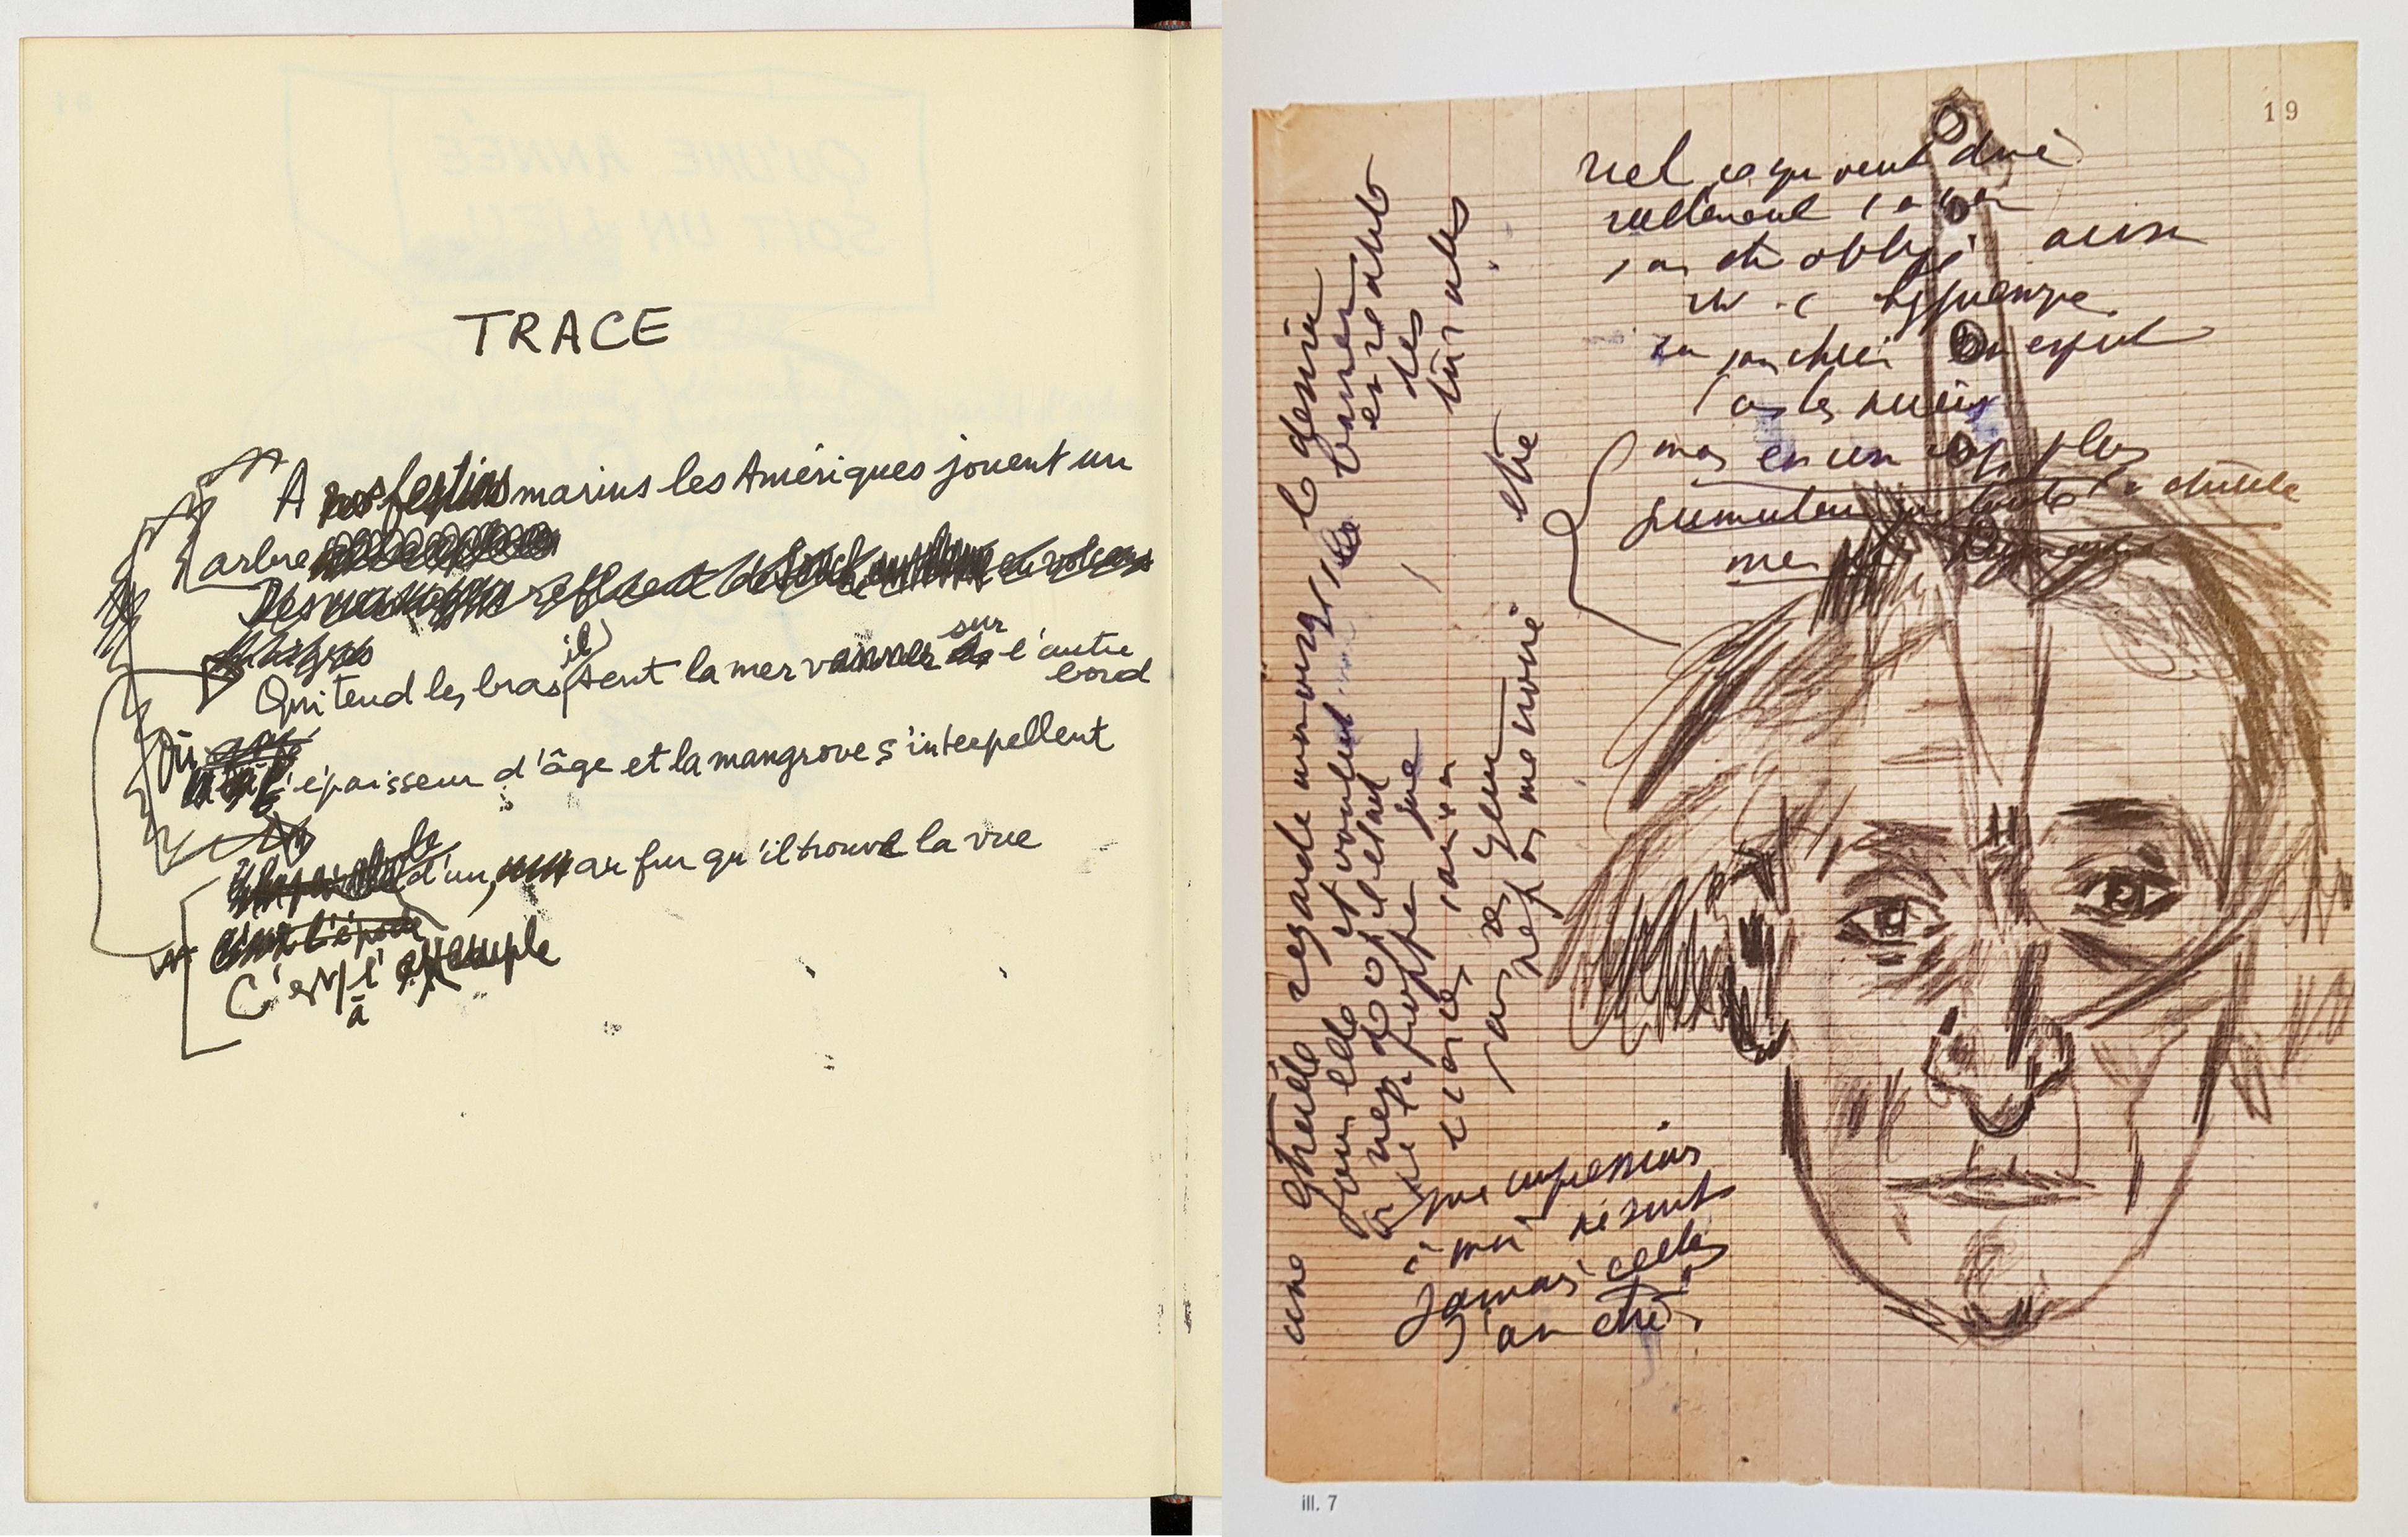 Édouard Glissant, <i>Cahier d'un Voyage sur le Nil</i> [Caderno de uma viagem ao Nilo], 1988. Bibliothèque nationale de France Antonin Artaud, Caderno 253. Bibliothèque nationale de France